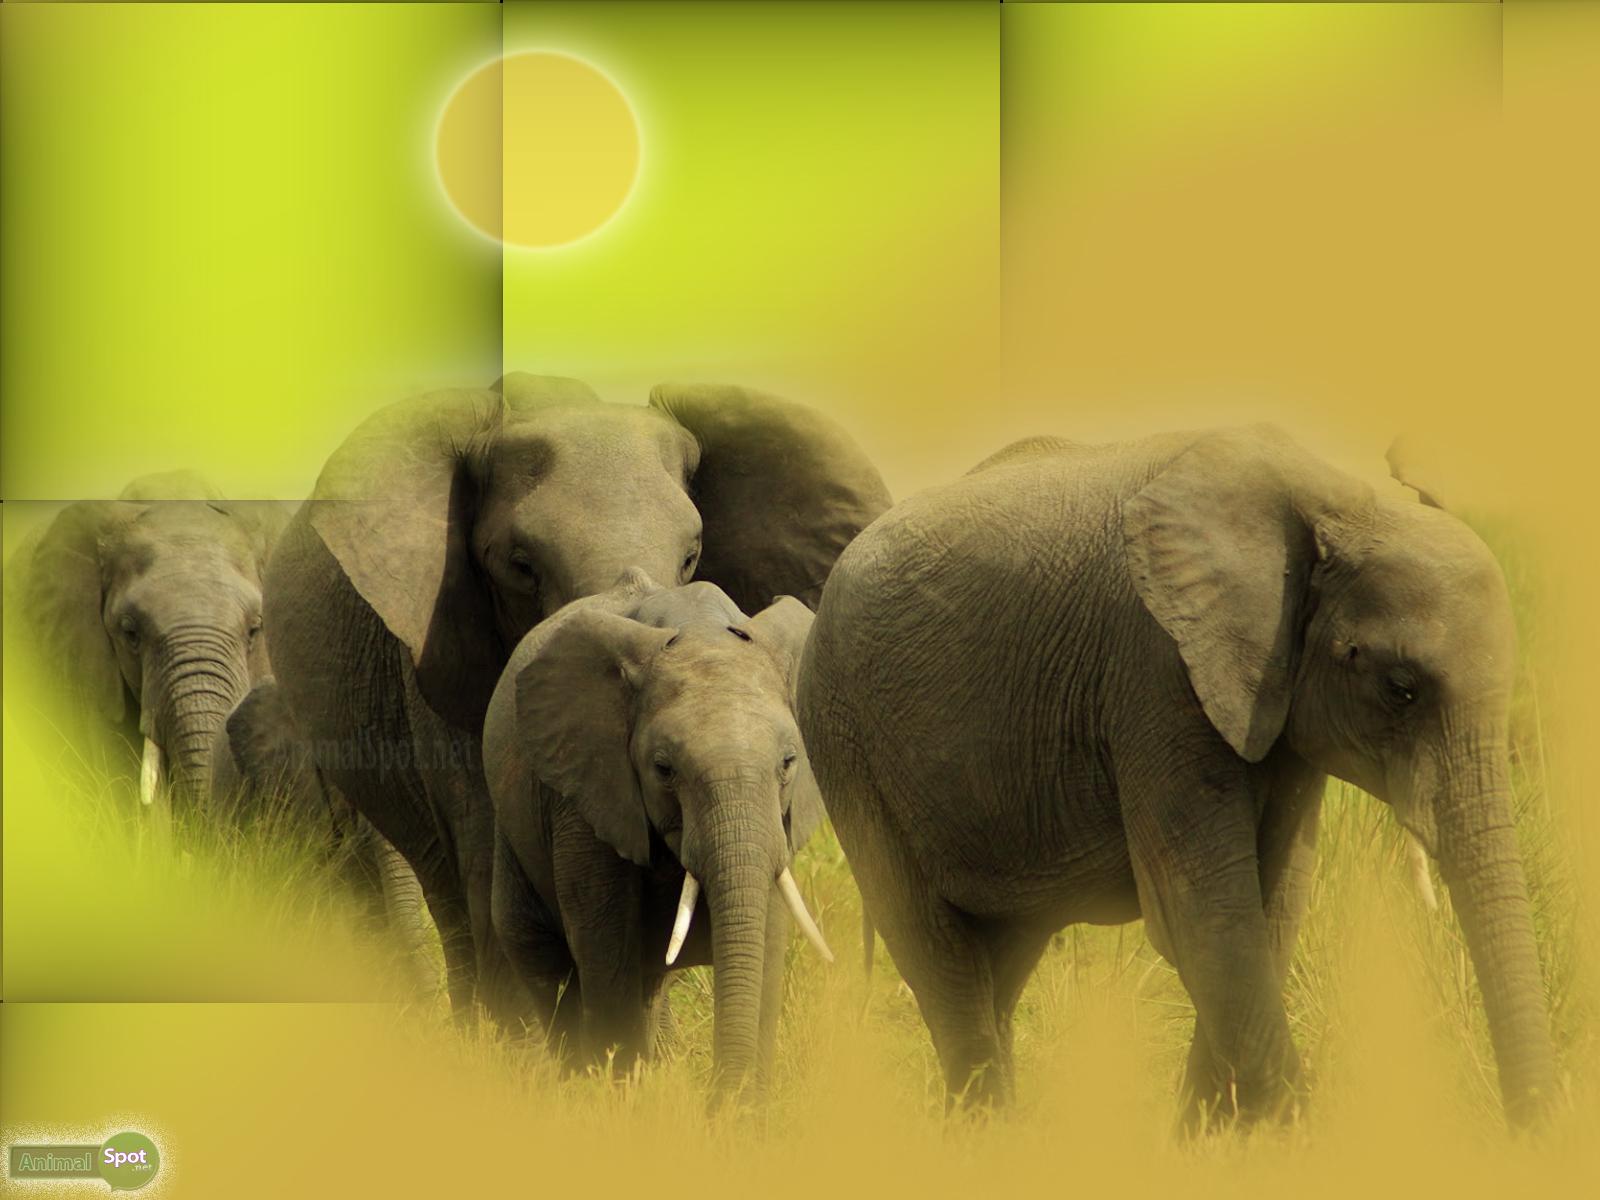 Elephant Wallpapers Animal Spot